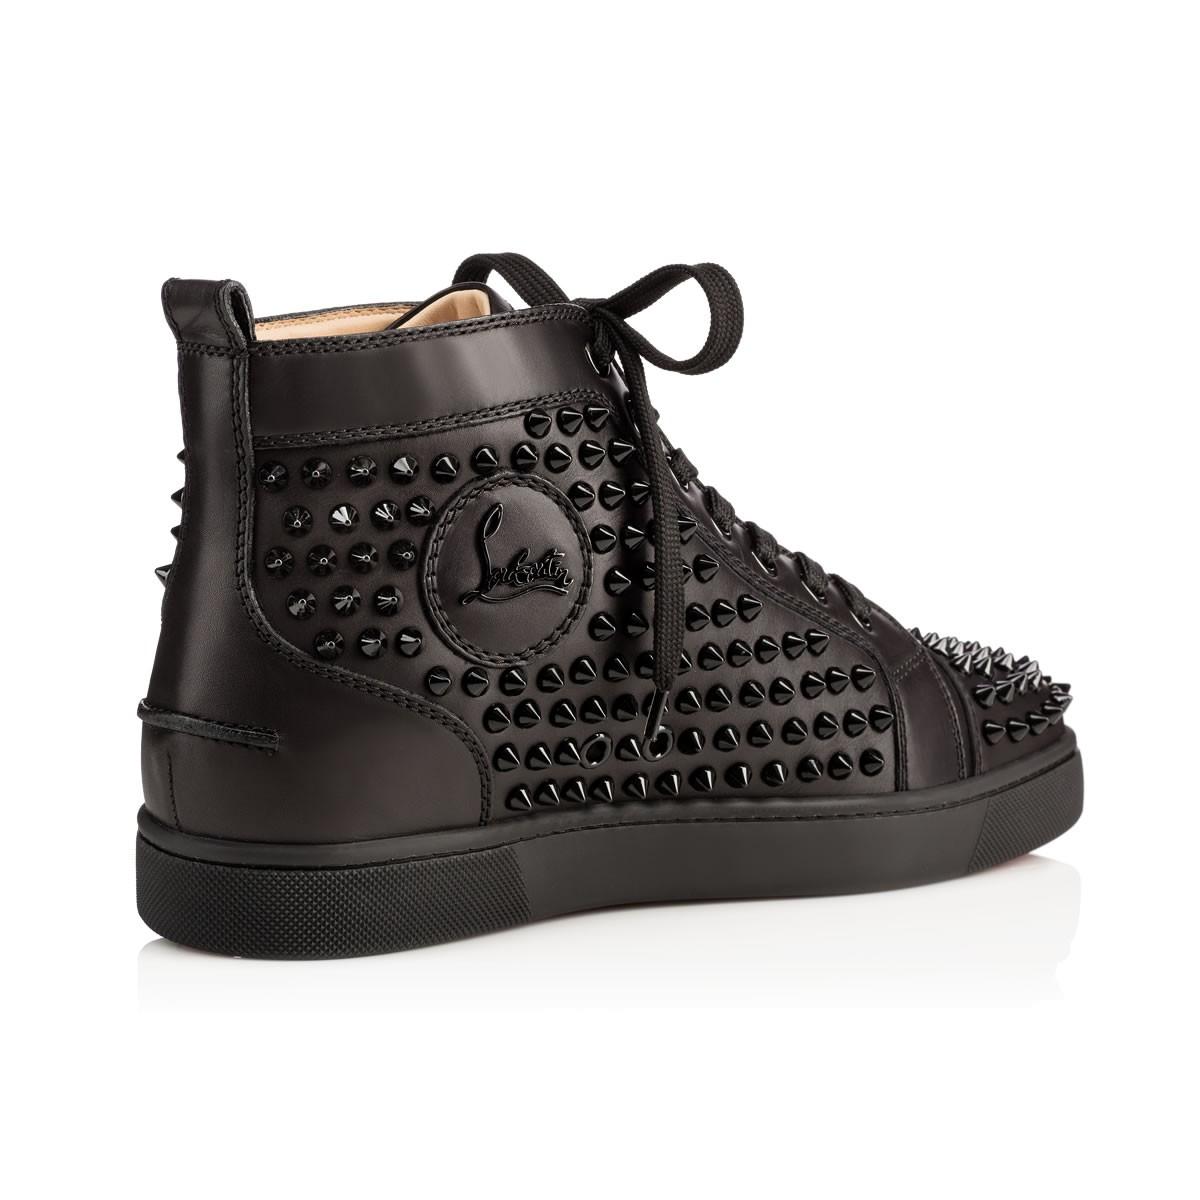 louis vuitton shoes red bottoms for men